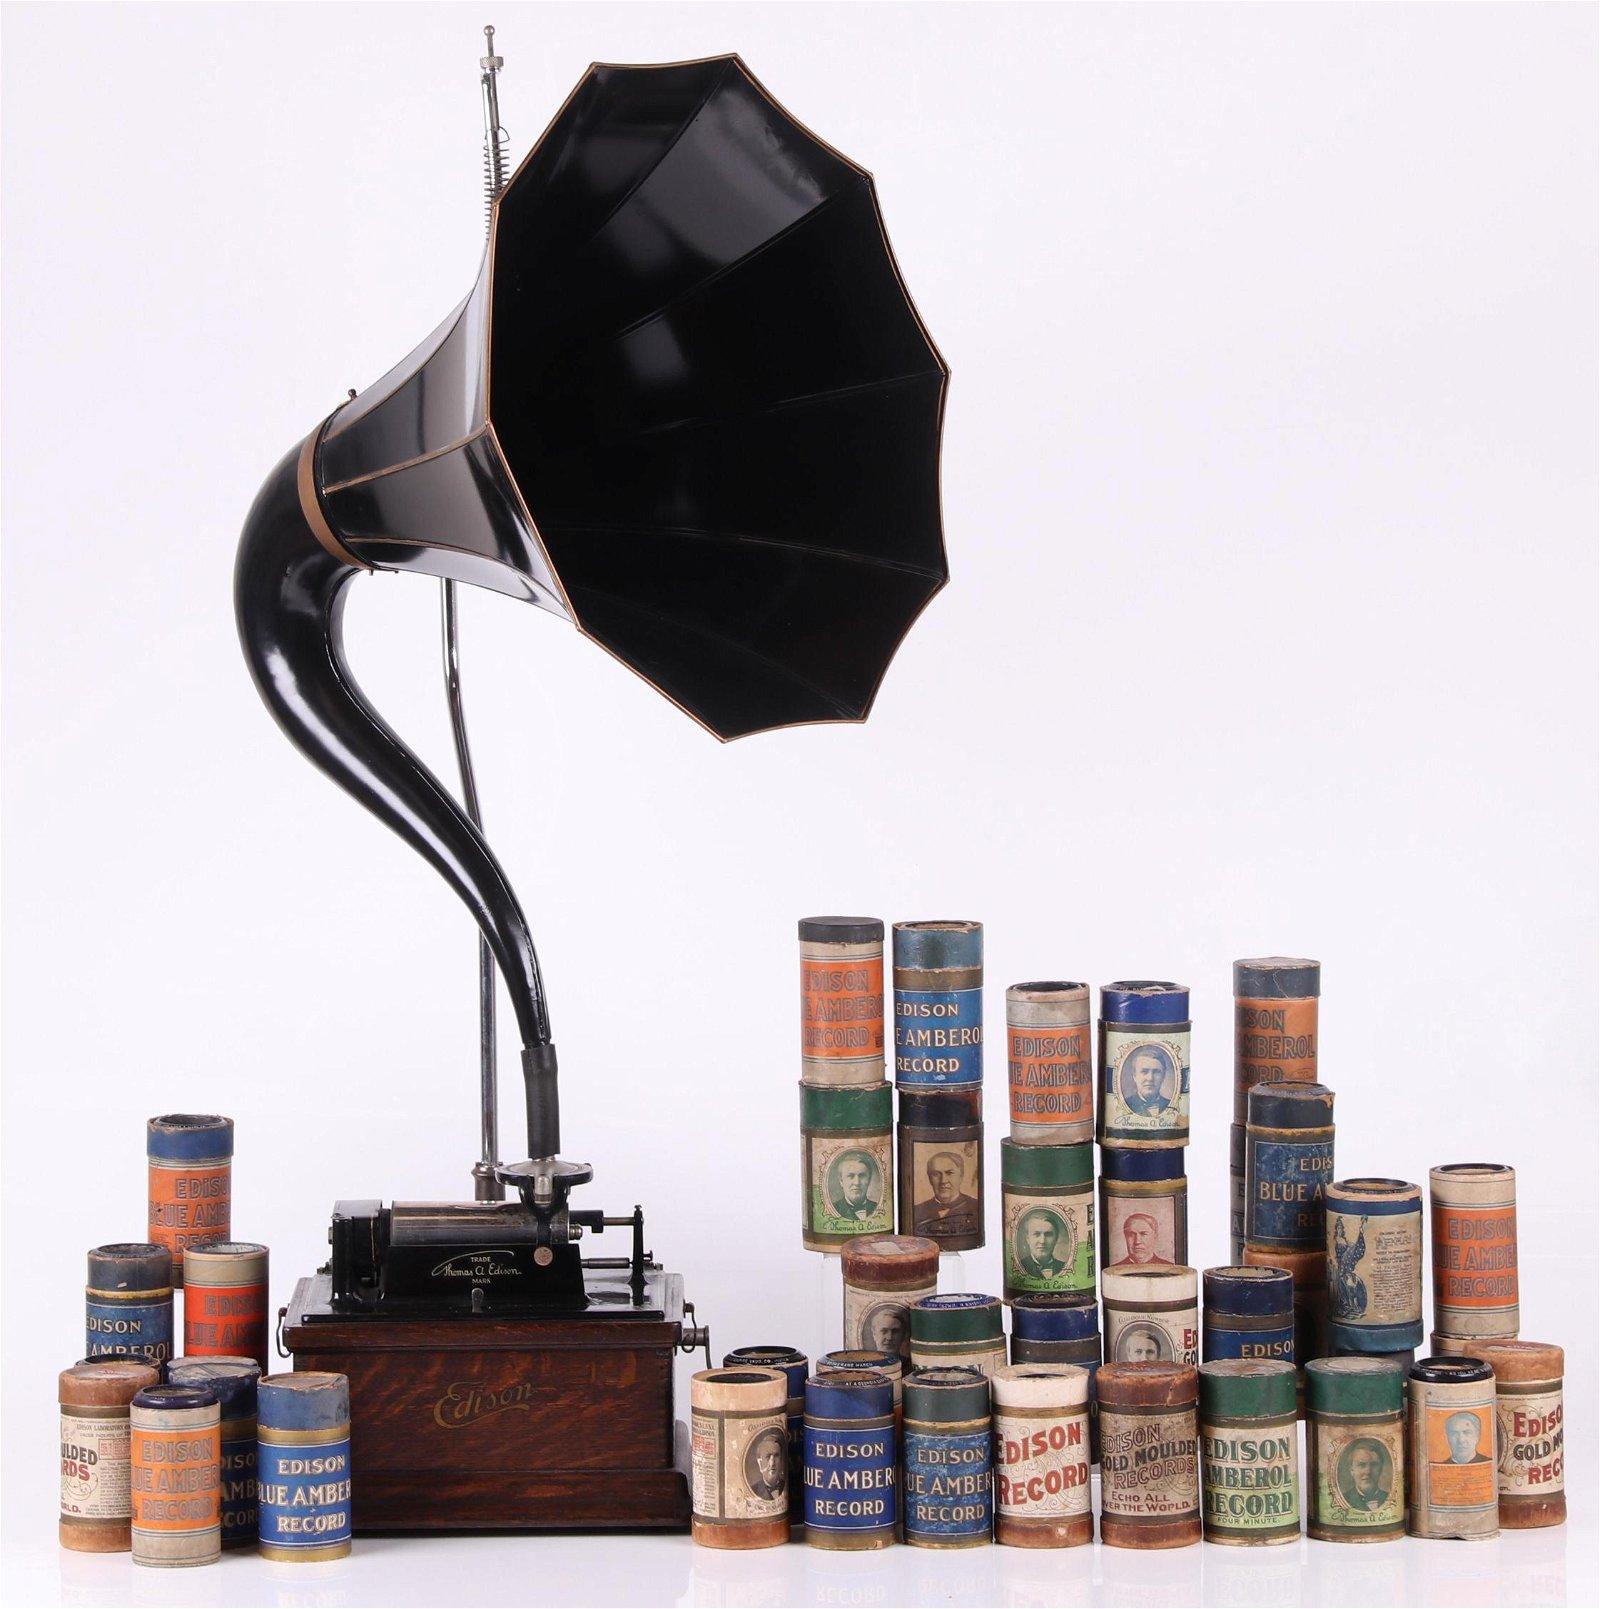 Edison Fireside Phonograph, Cylinders